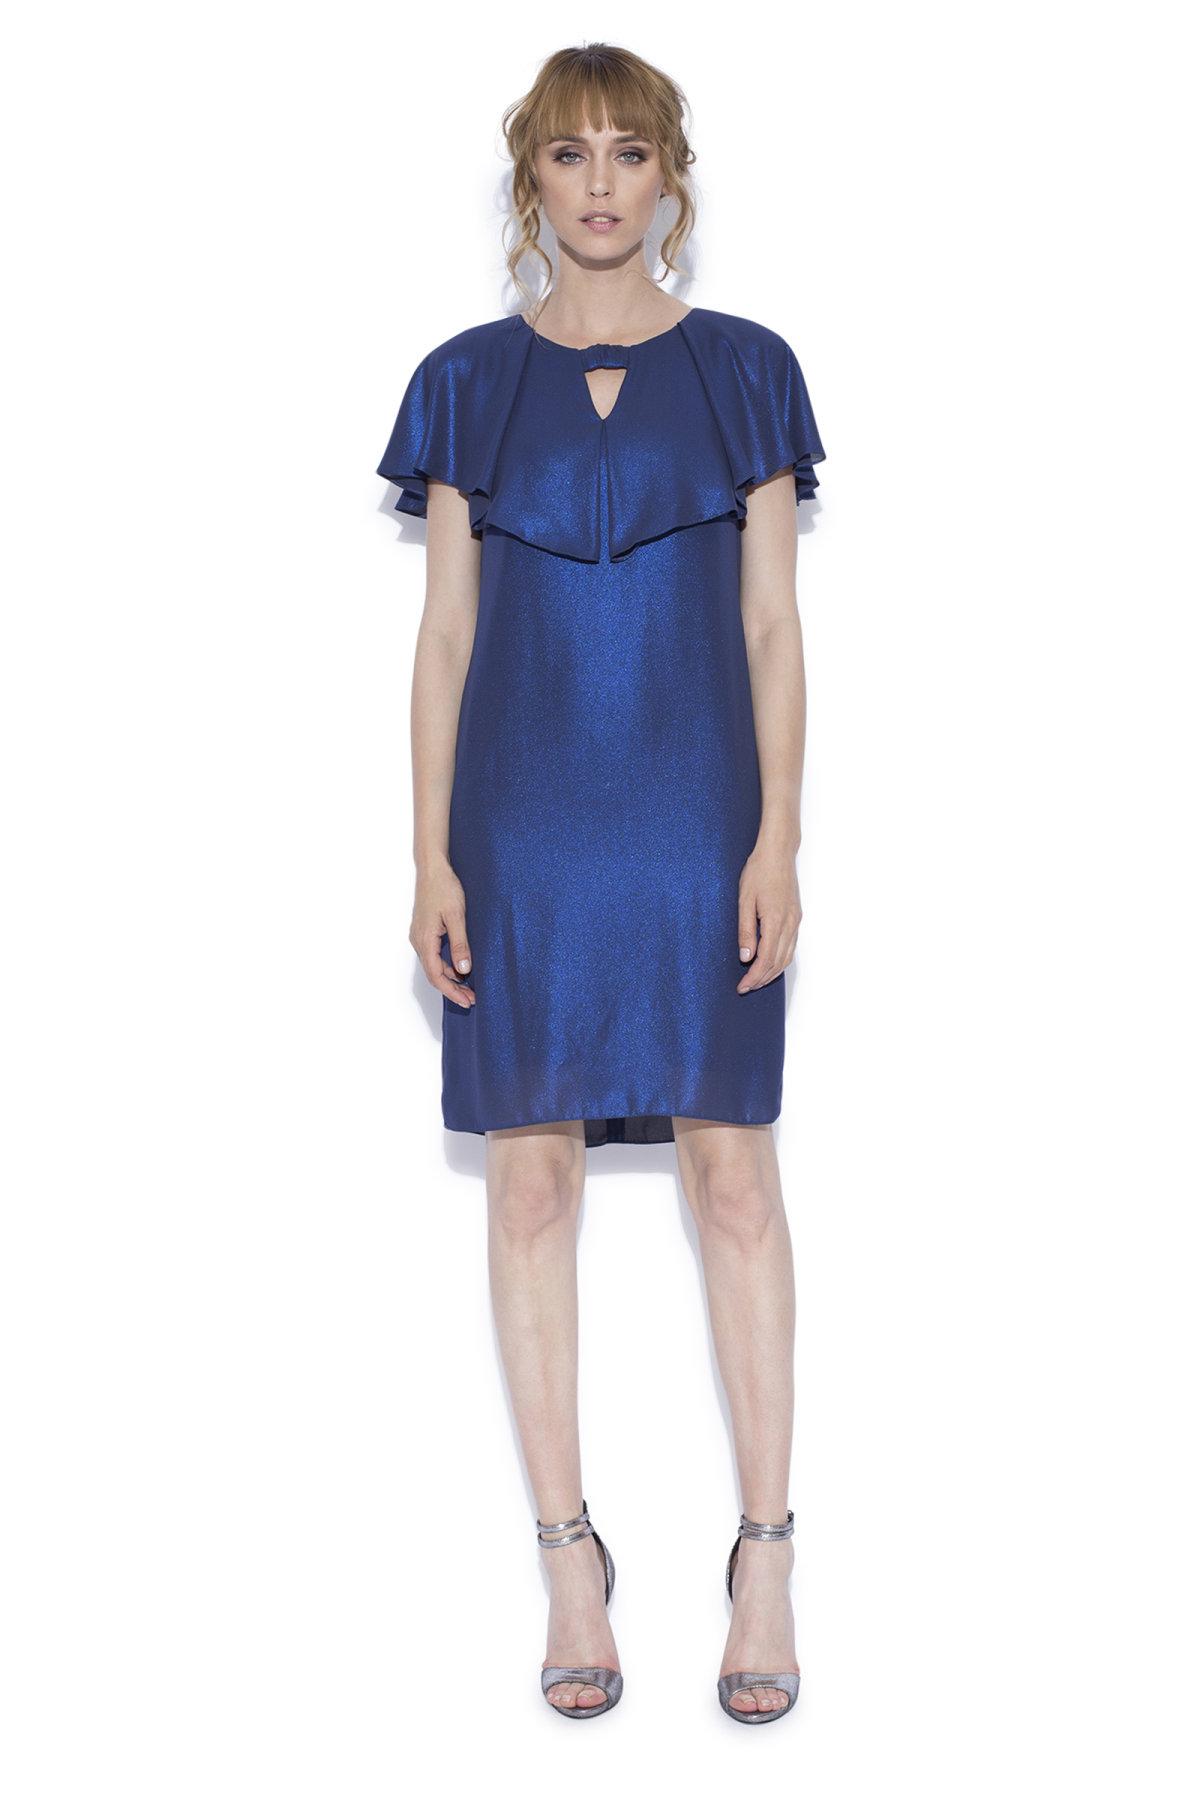 Rochie de seara albastru sidef Bleumarin